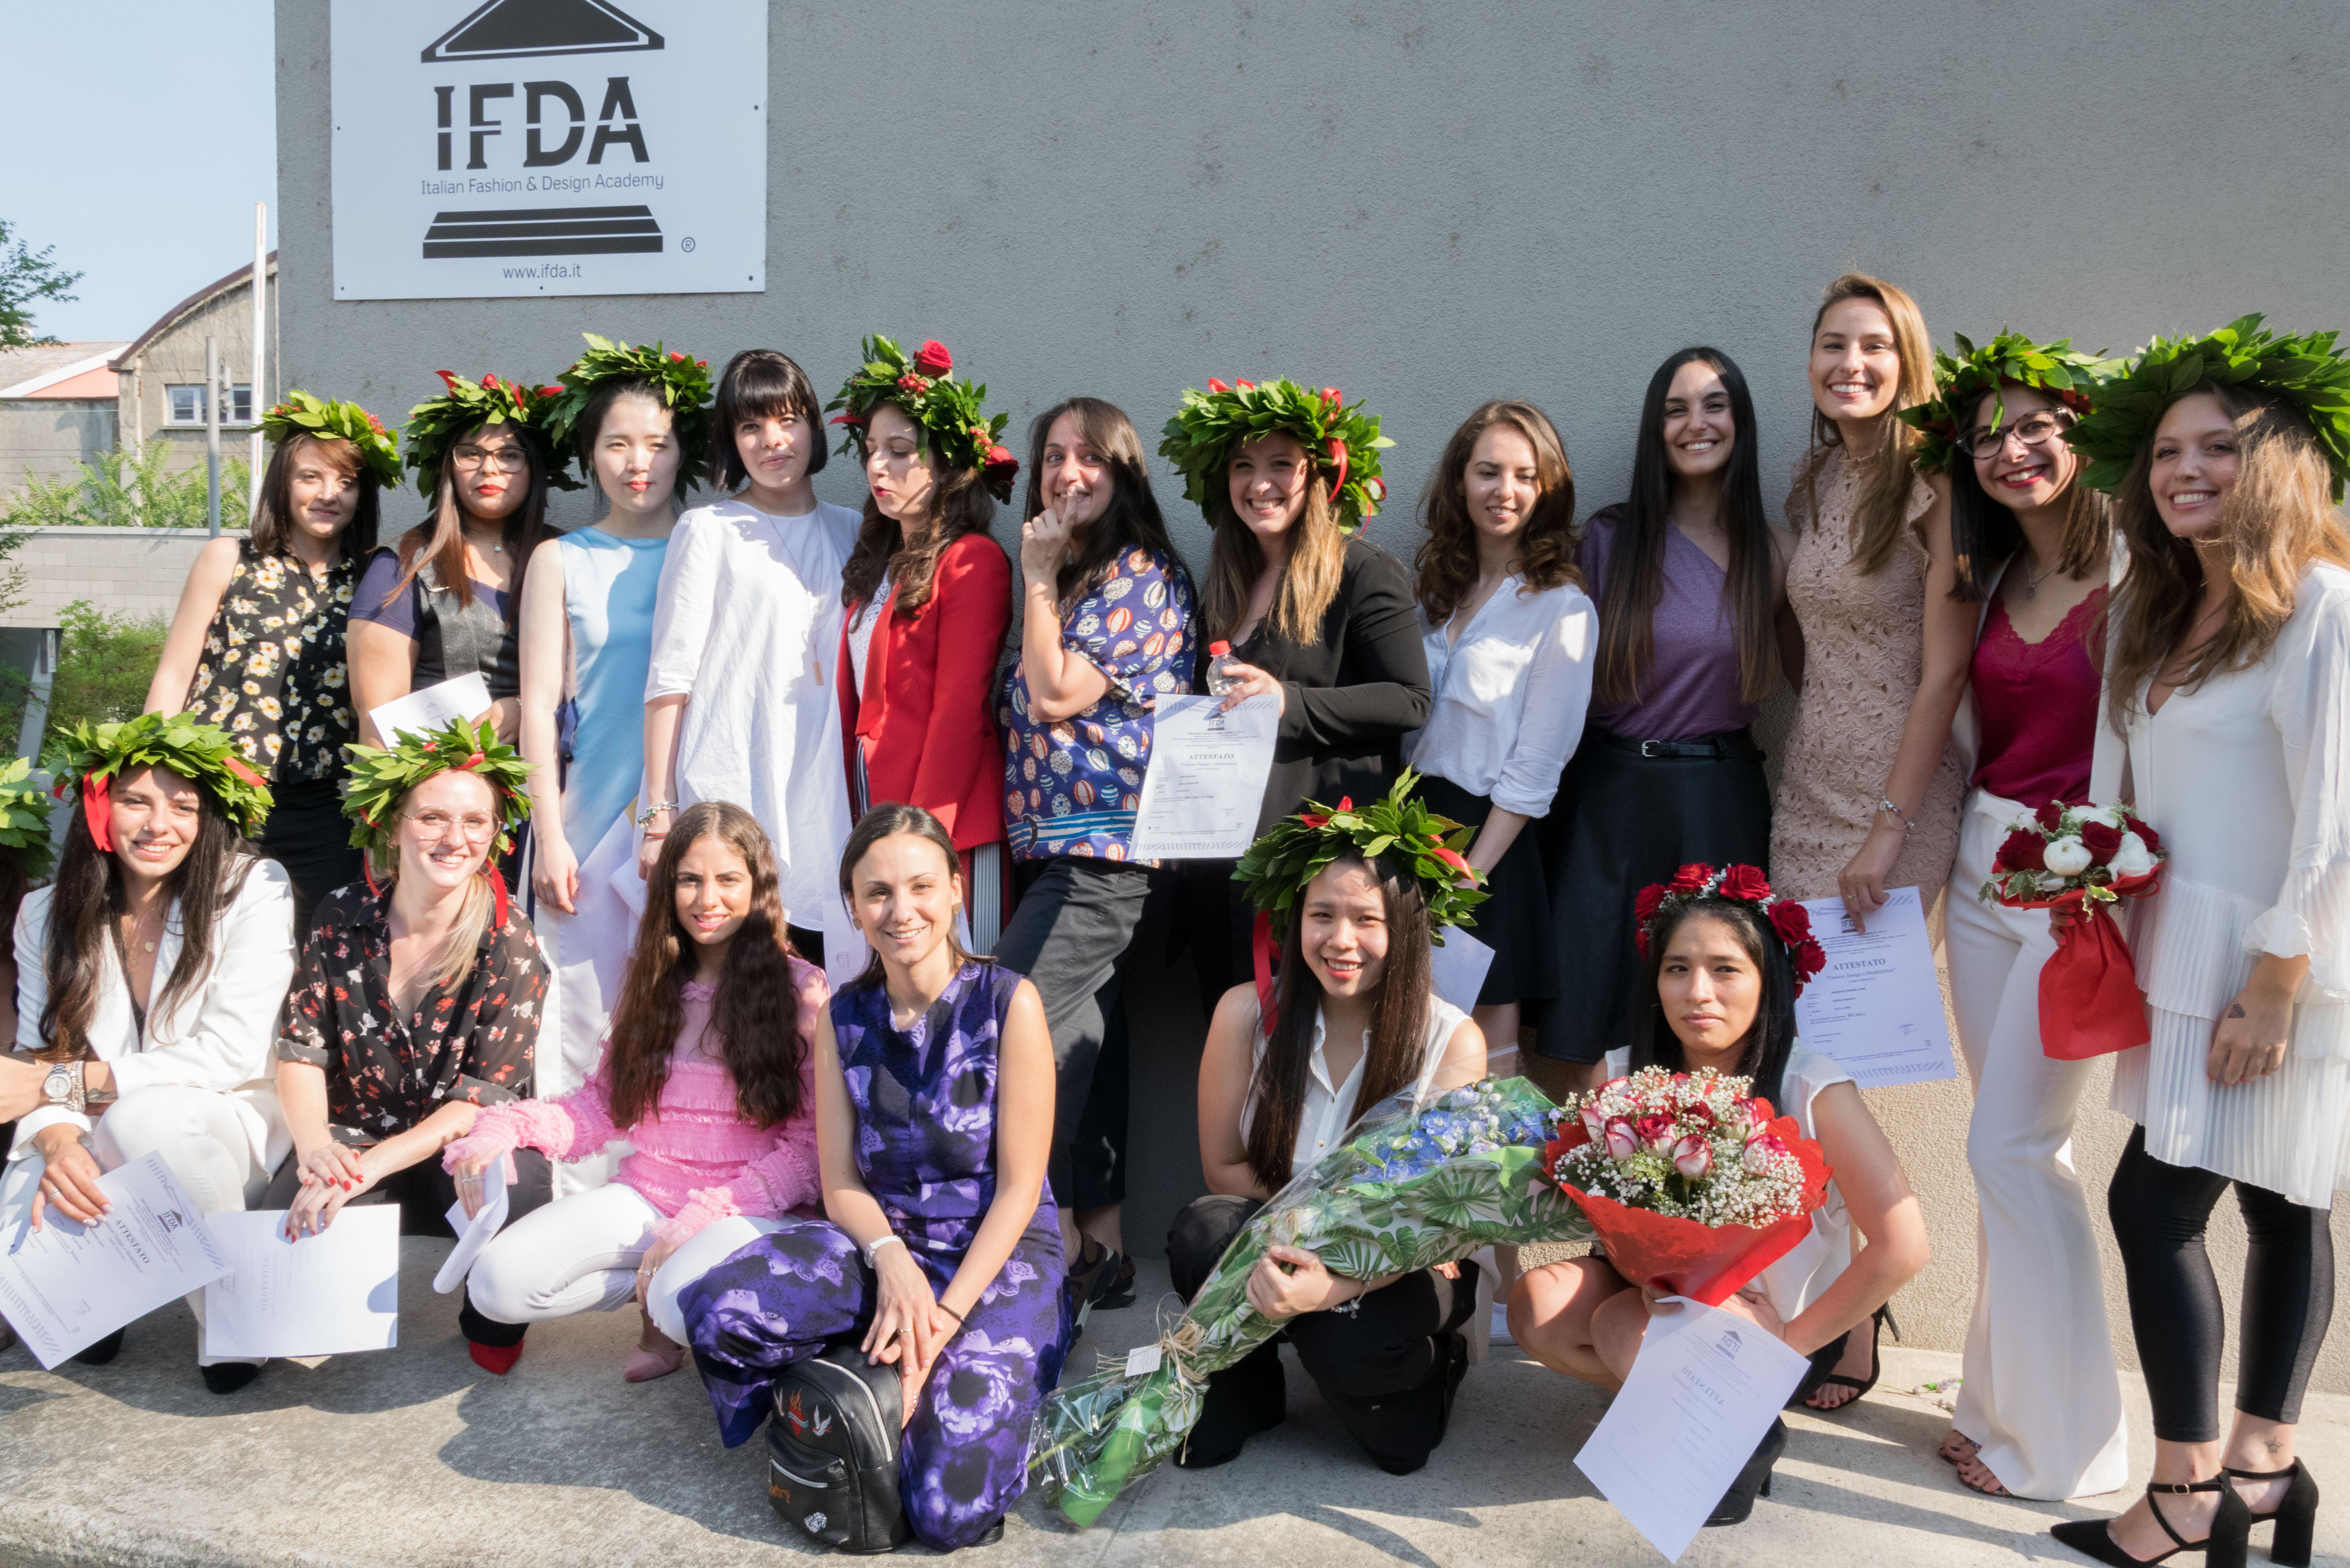 IFDA fashion graduation